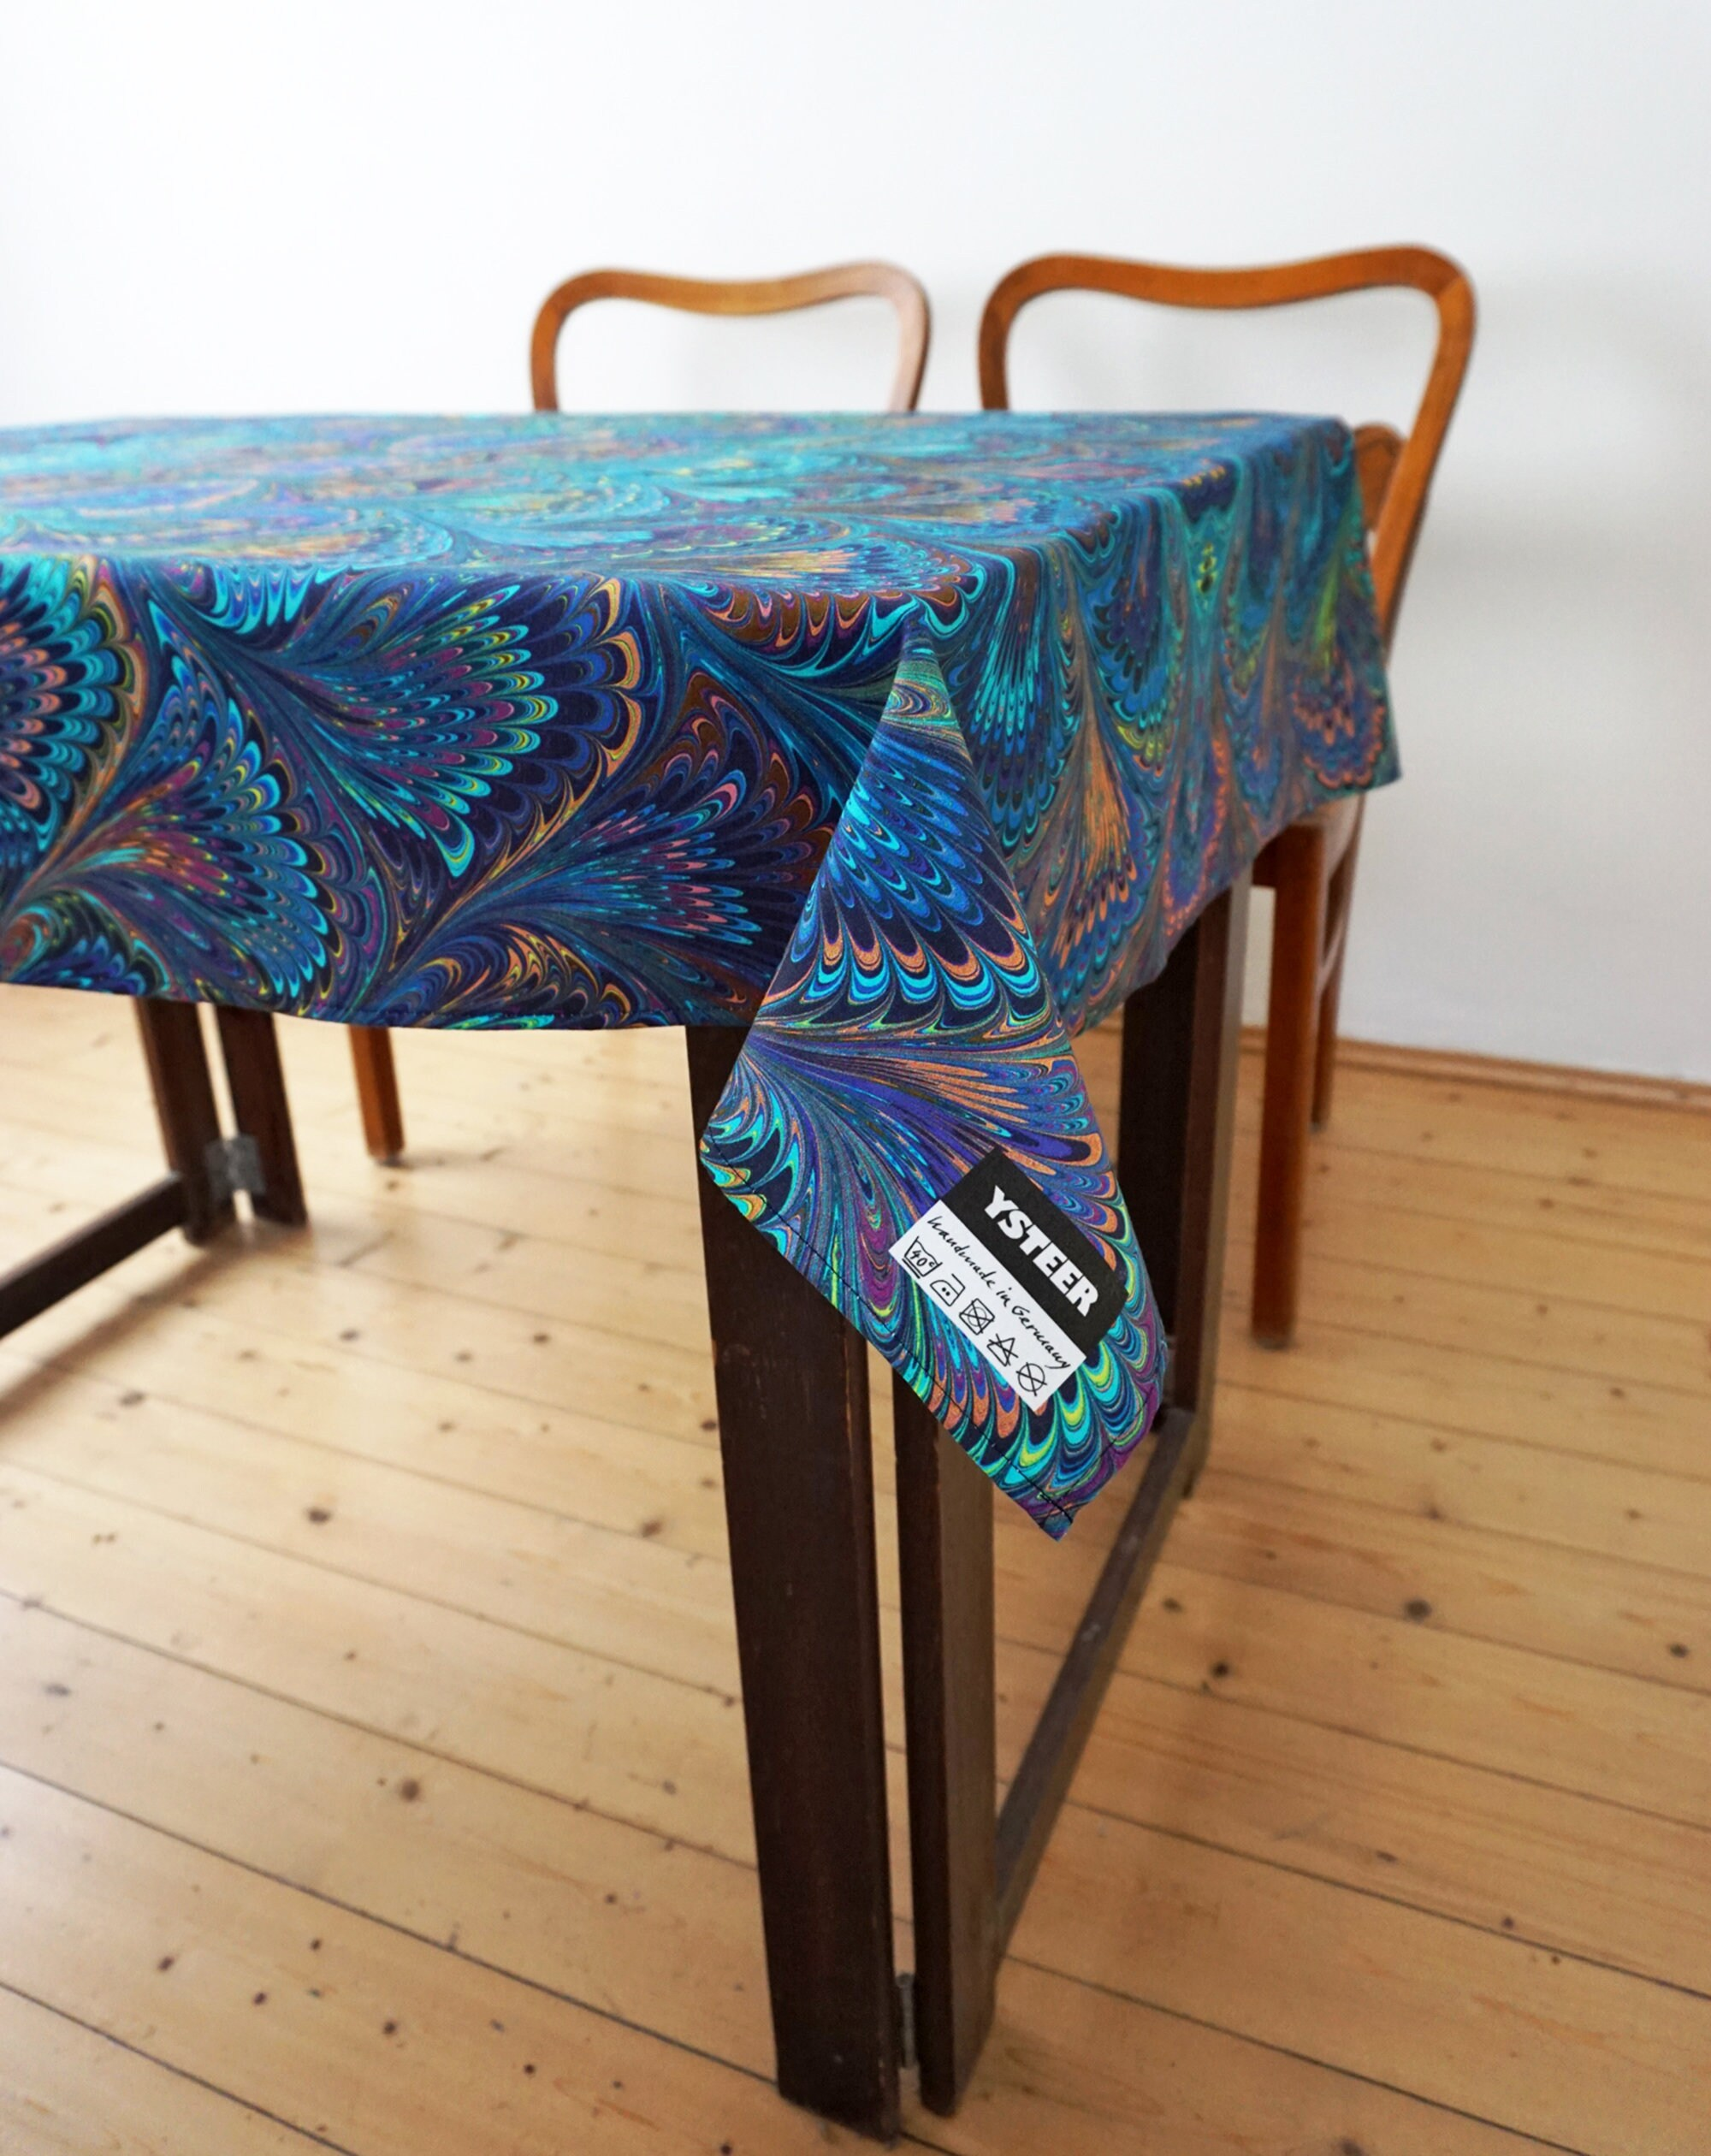 ART DECO TABLECLOTH Organic Cotton Vintage Beach Towel 1920th digital print 1920-1940 1930th marbling Art Nouveau table runner